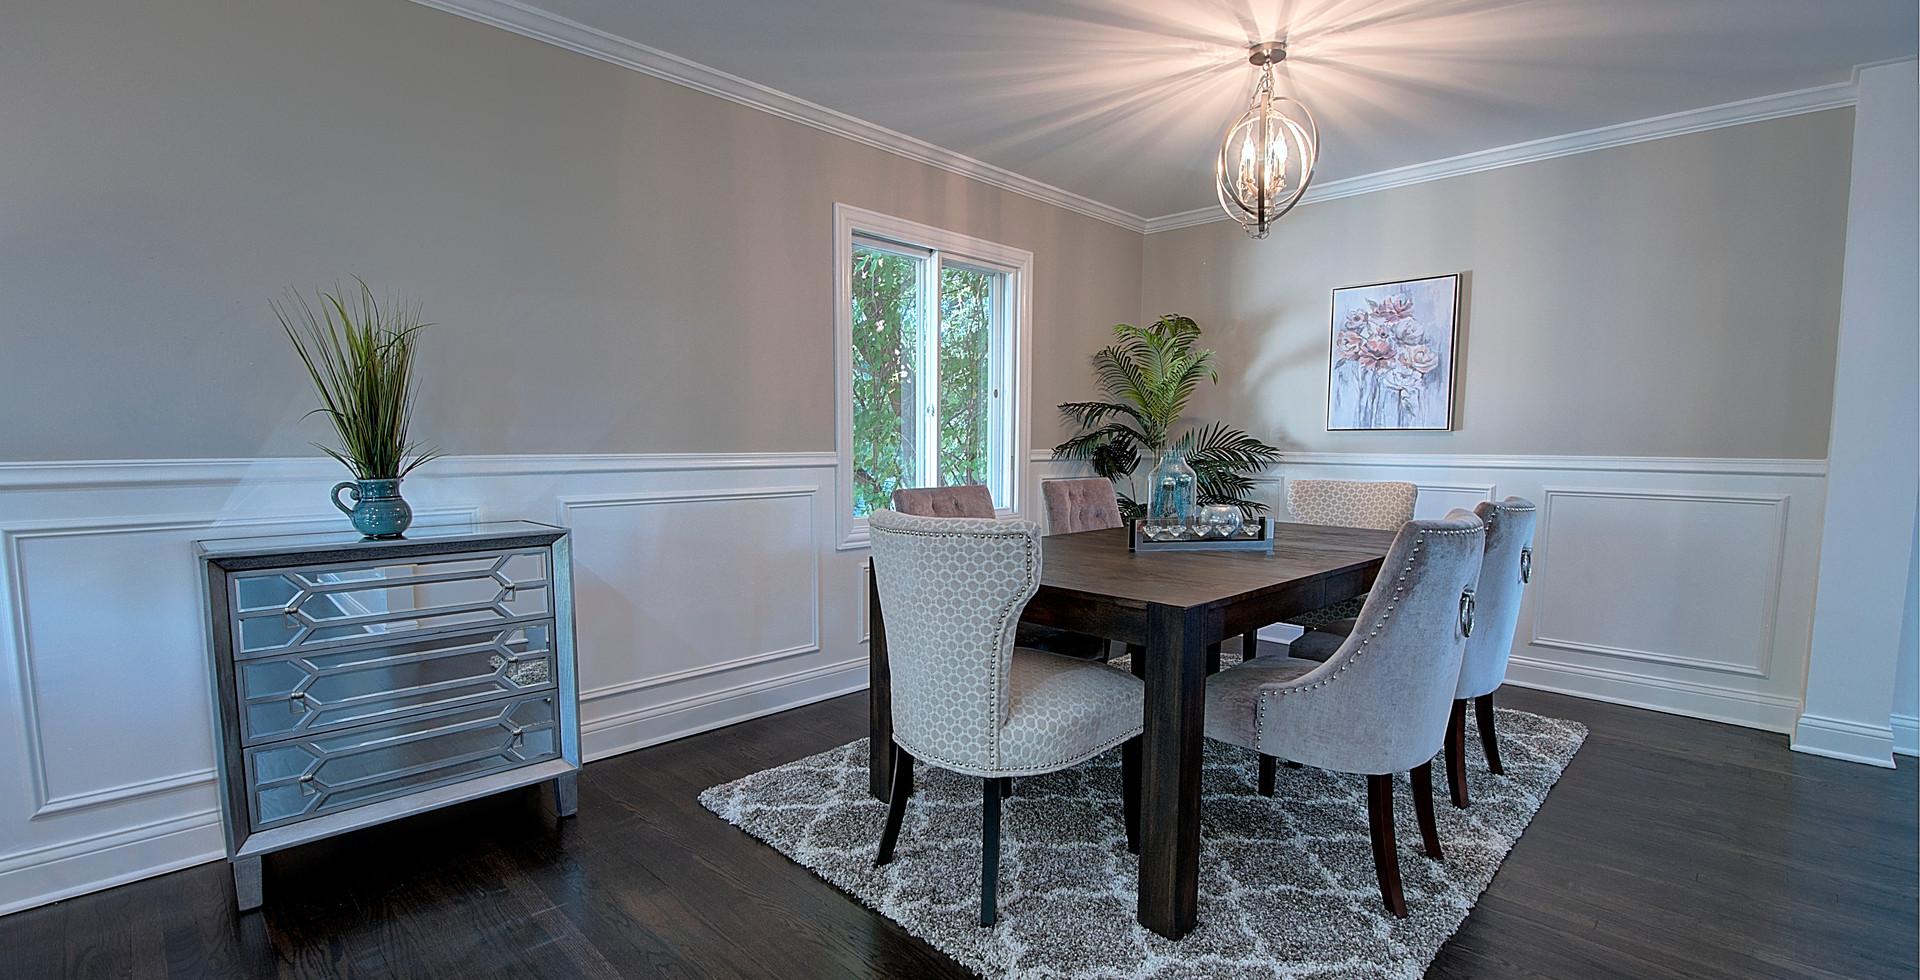 Dining Room in Hinsdale designed by MRM Home Design.jpg